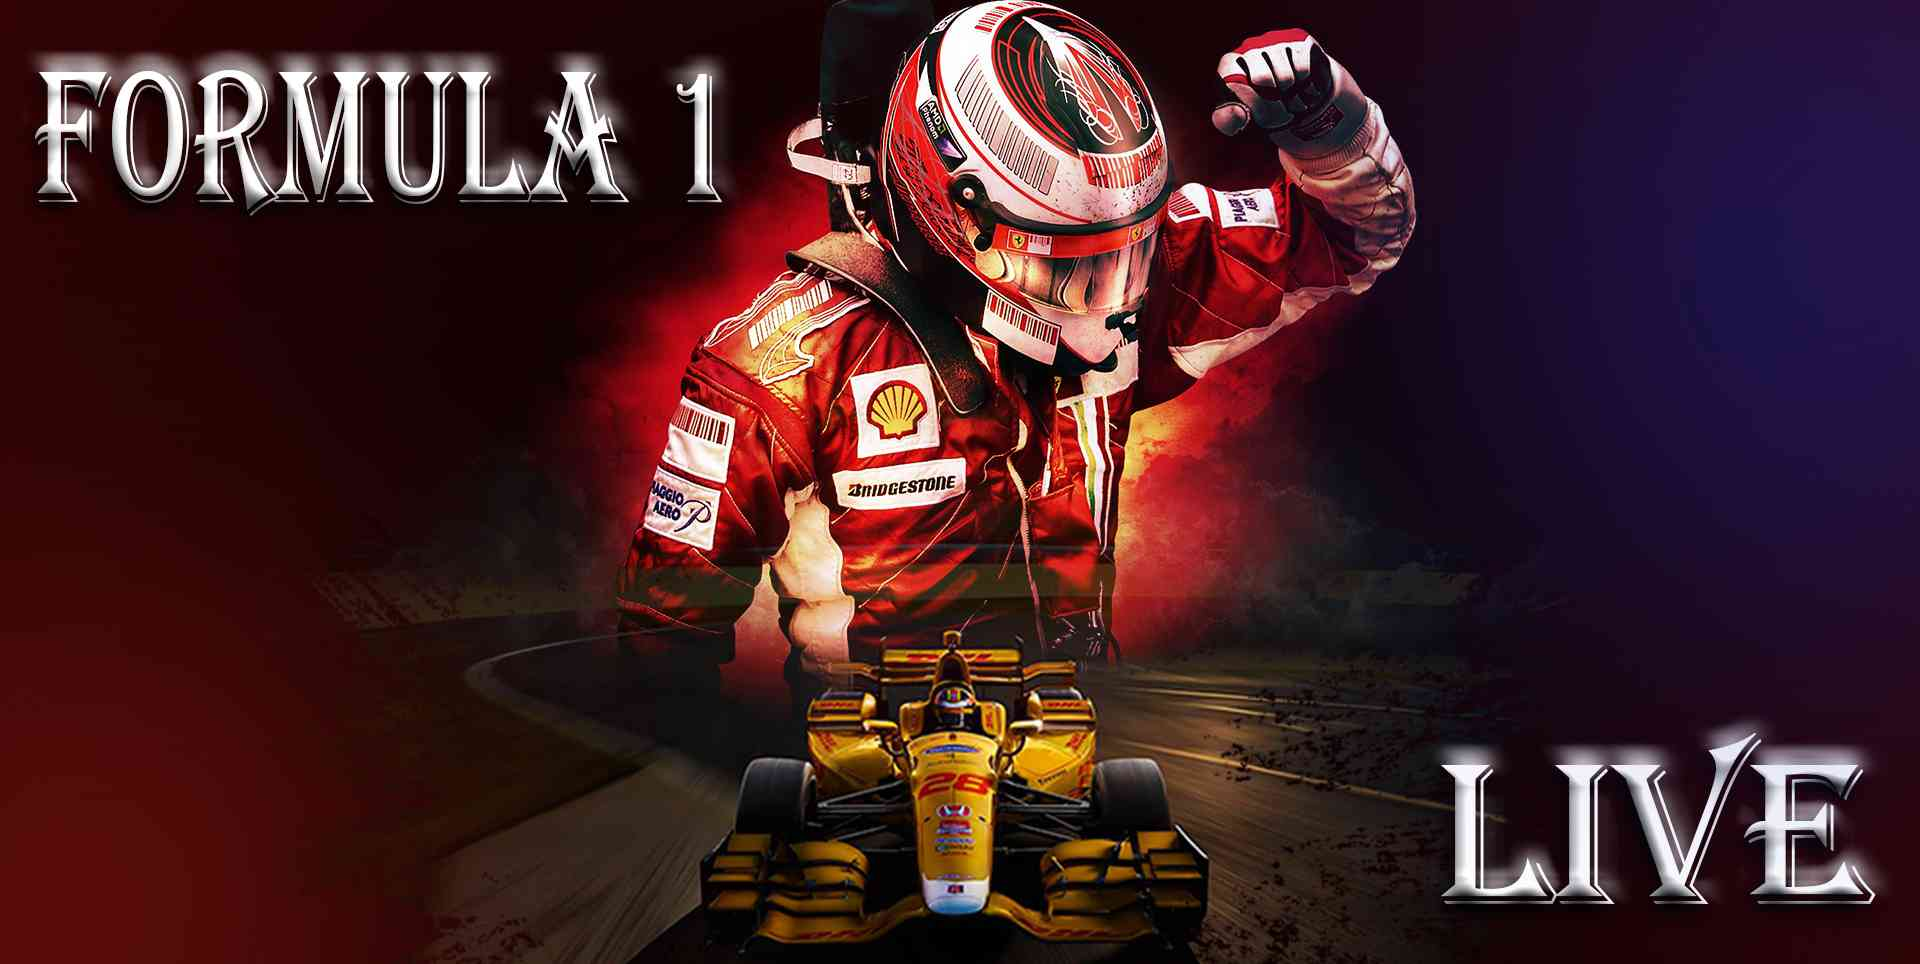 super-formula-2016-round-1-suzuka-race